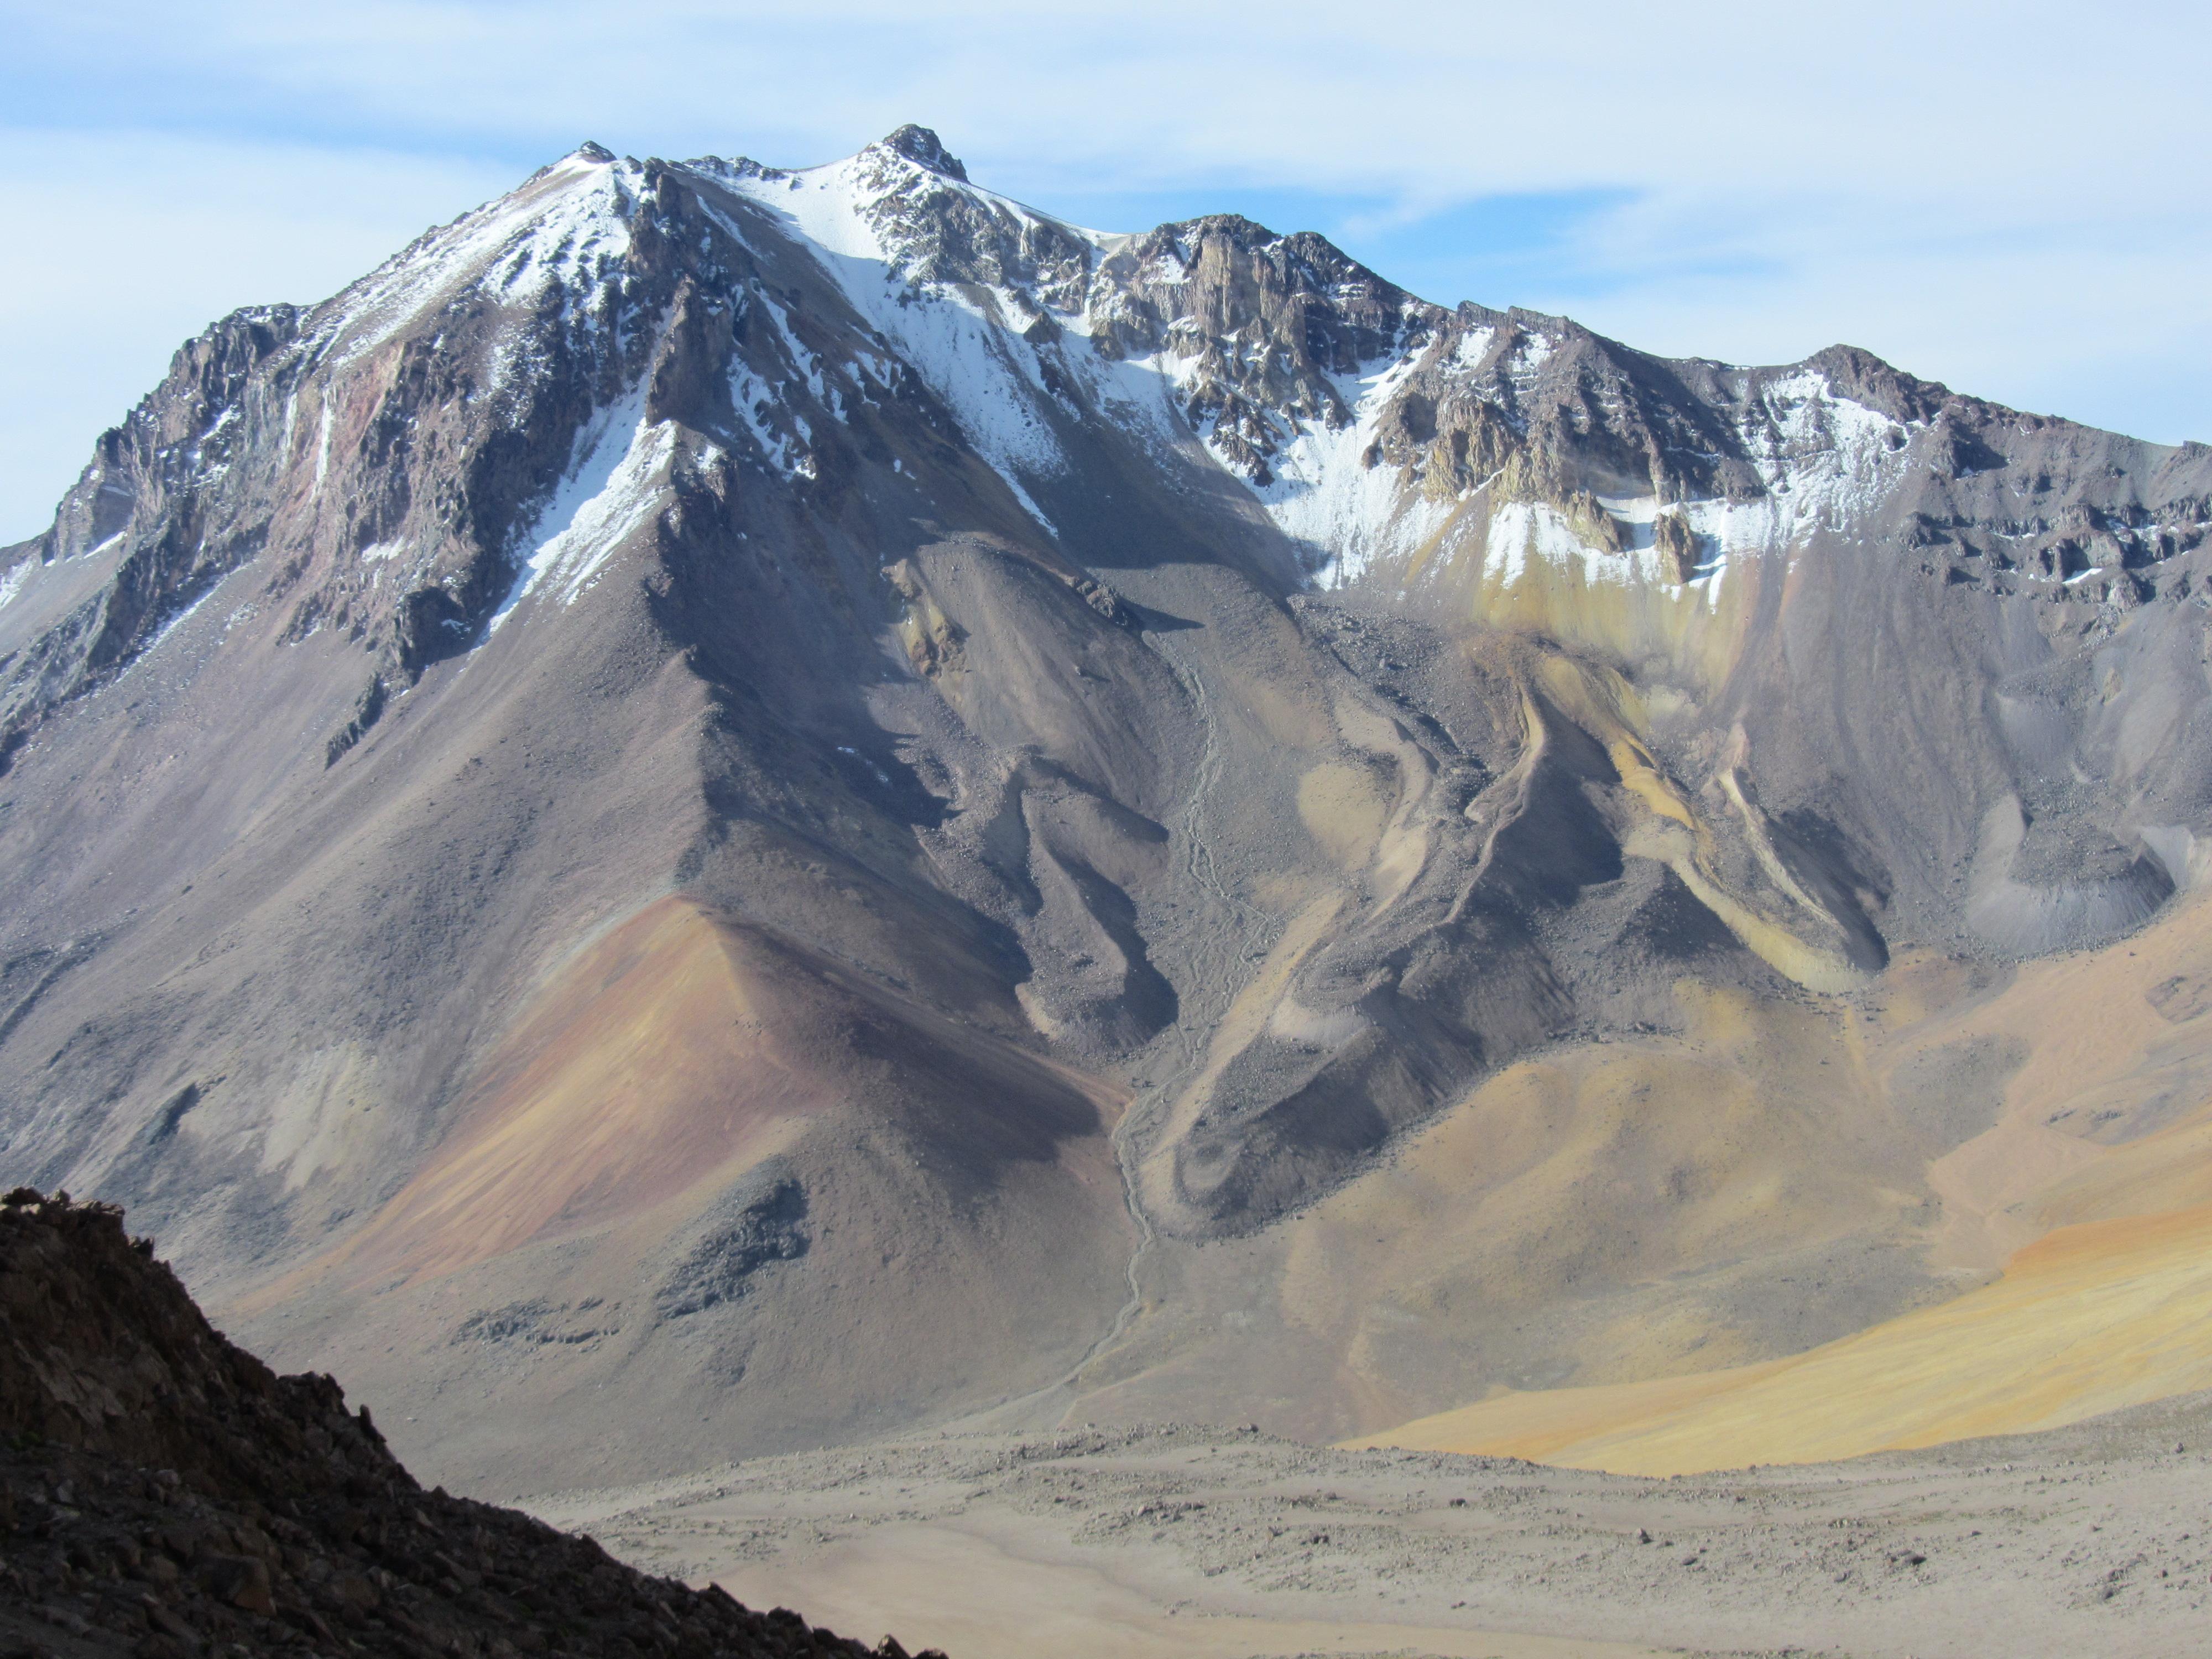 Volcan Chachani 6057 m.